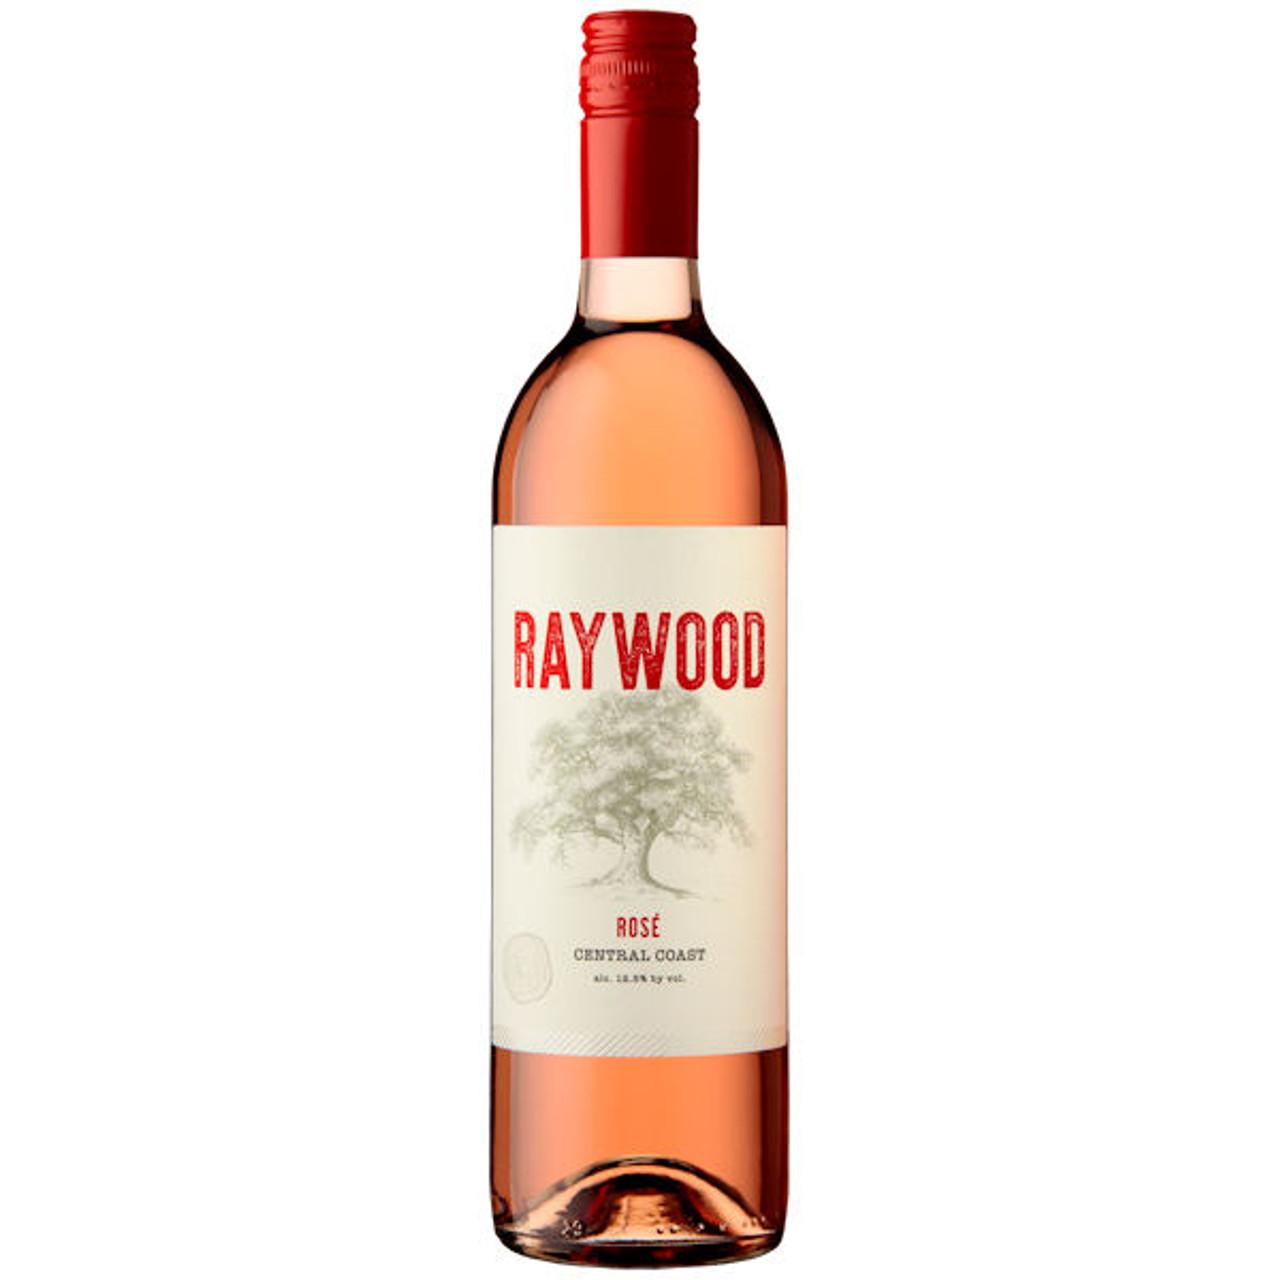 Raywood Central Coast Rose